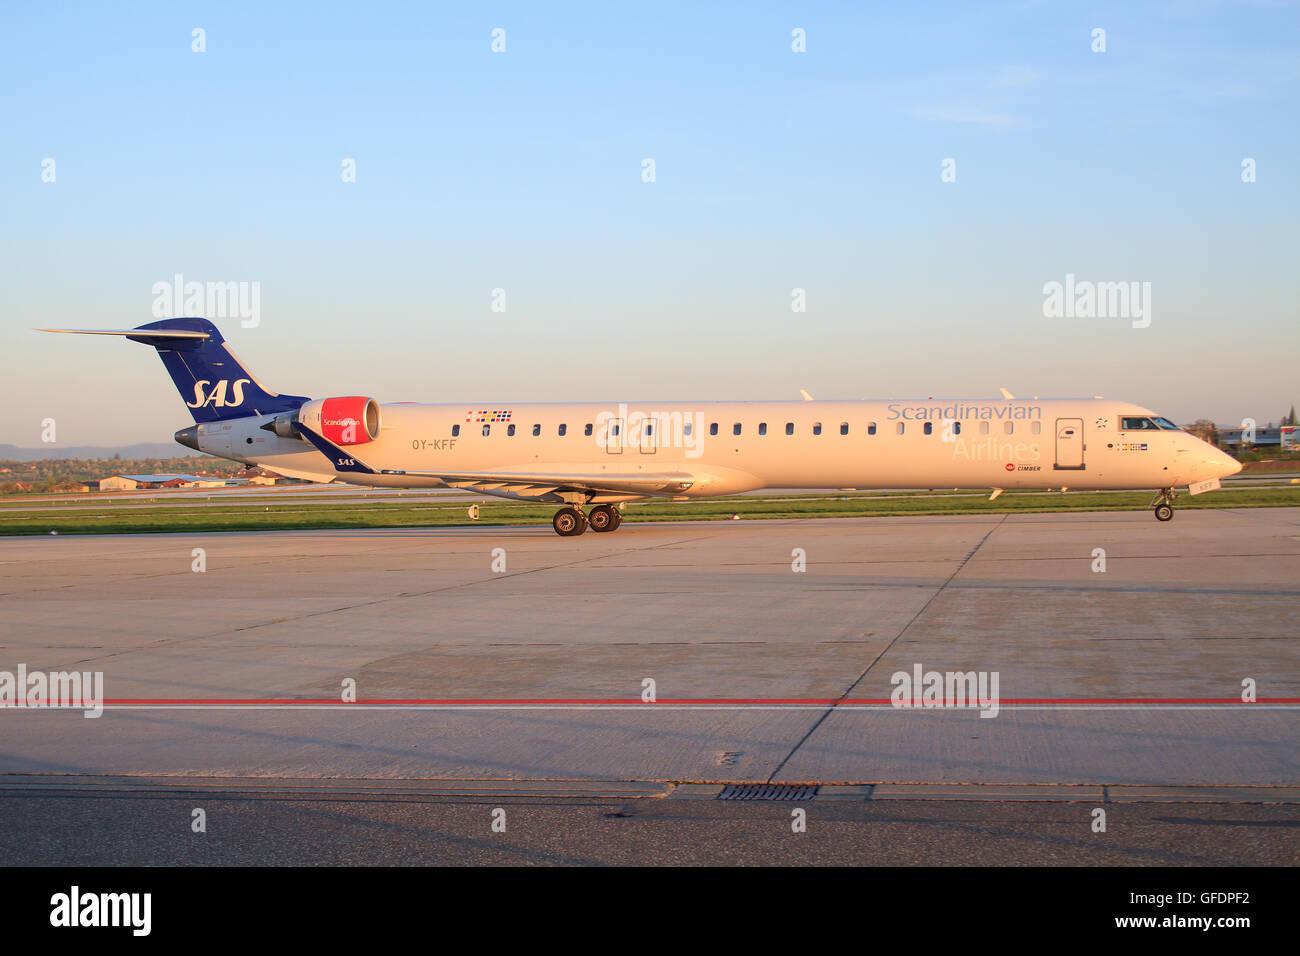 WARSAW, POLAND - JULY 8: SAS Scandinavian Airlines Canadair CL-600-2D24 Regional Jet CRJ-900LR - Stock Image